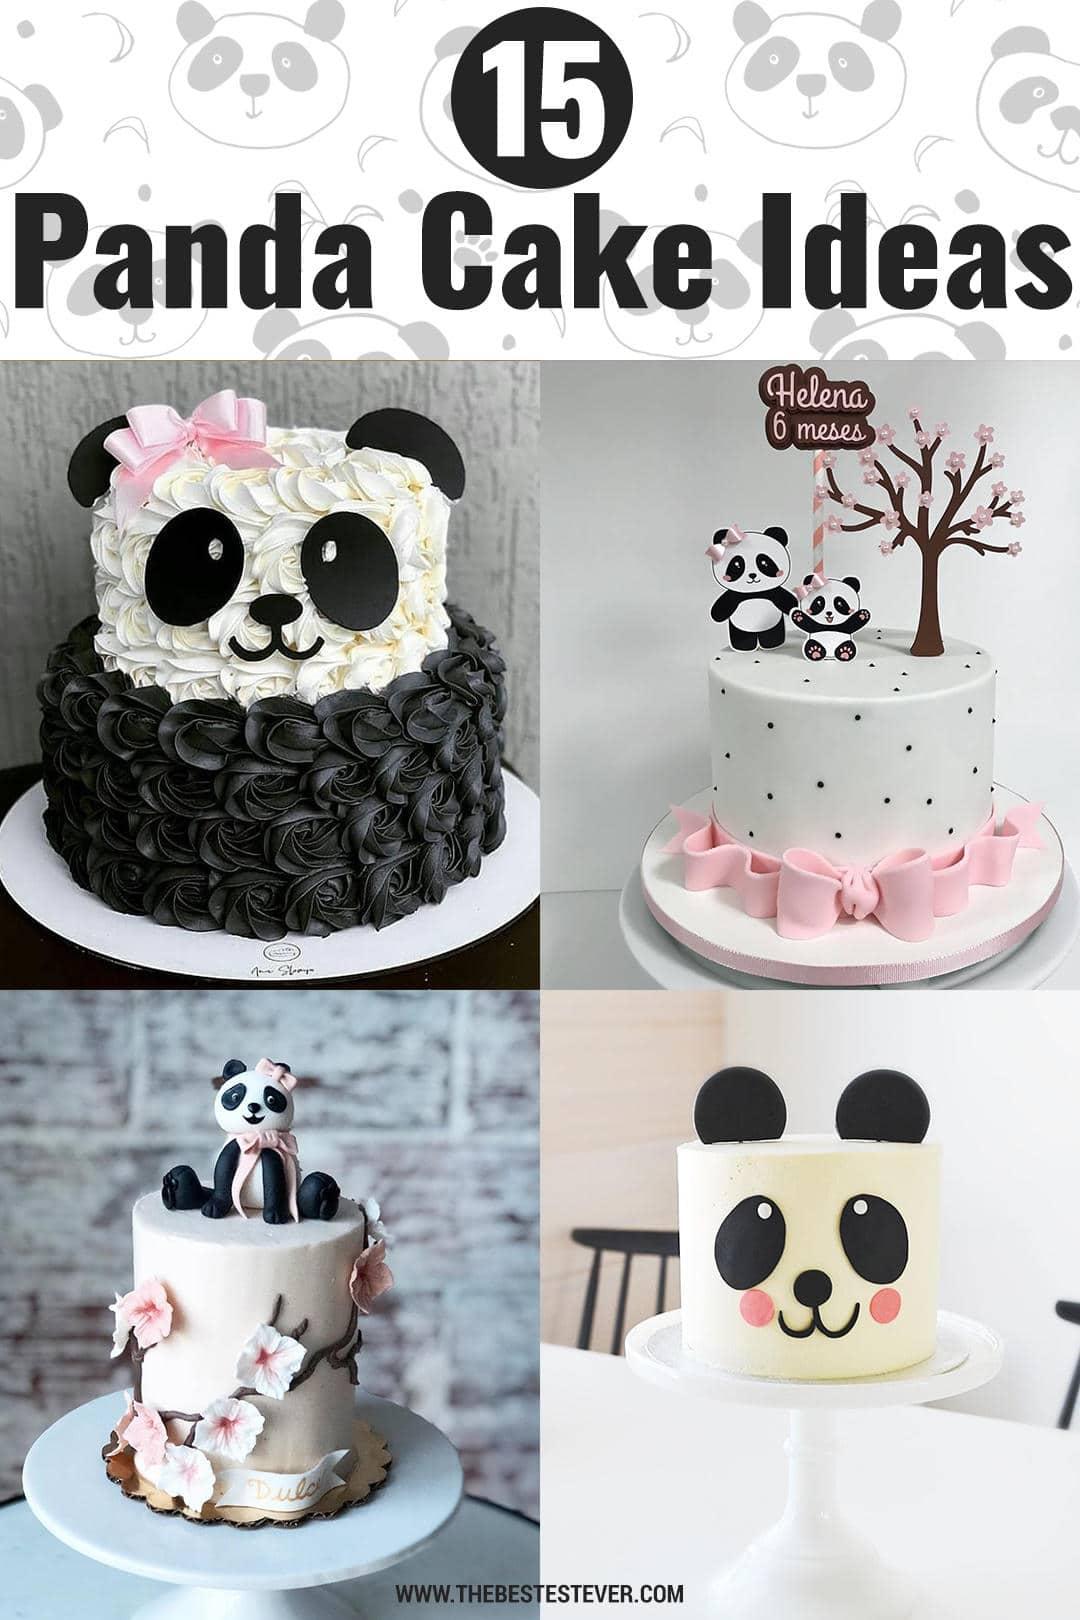 15 Cute & Adorable Panda Cake Ideas & Designs